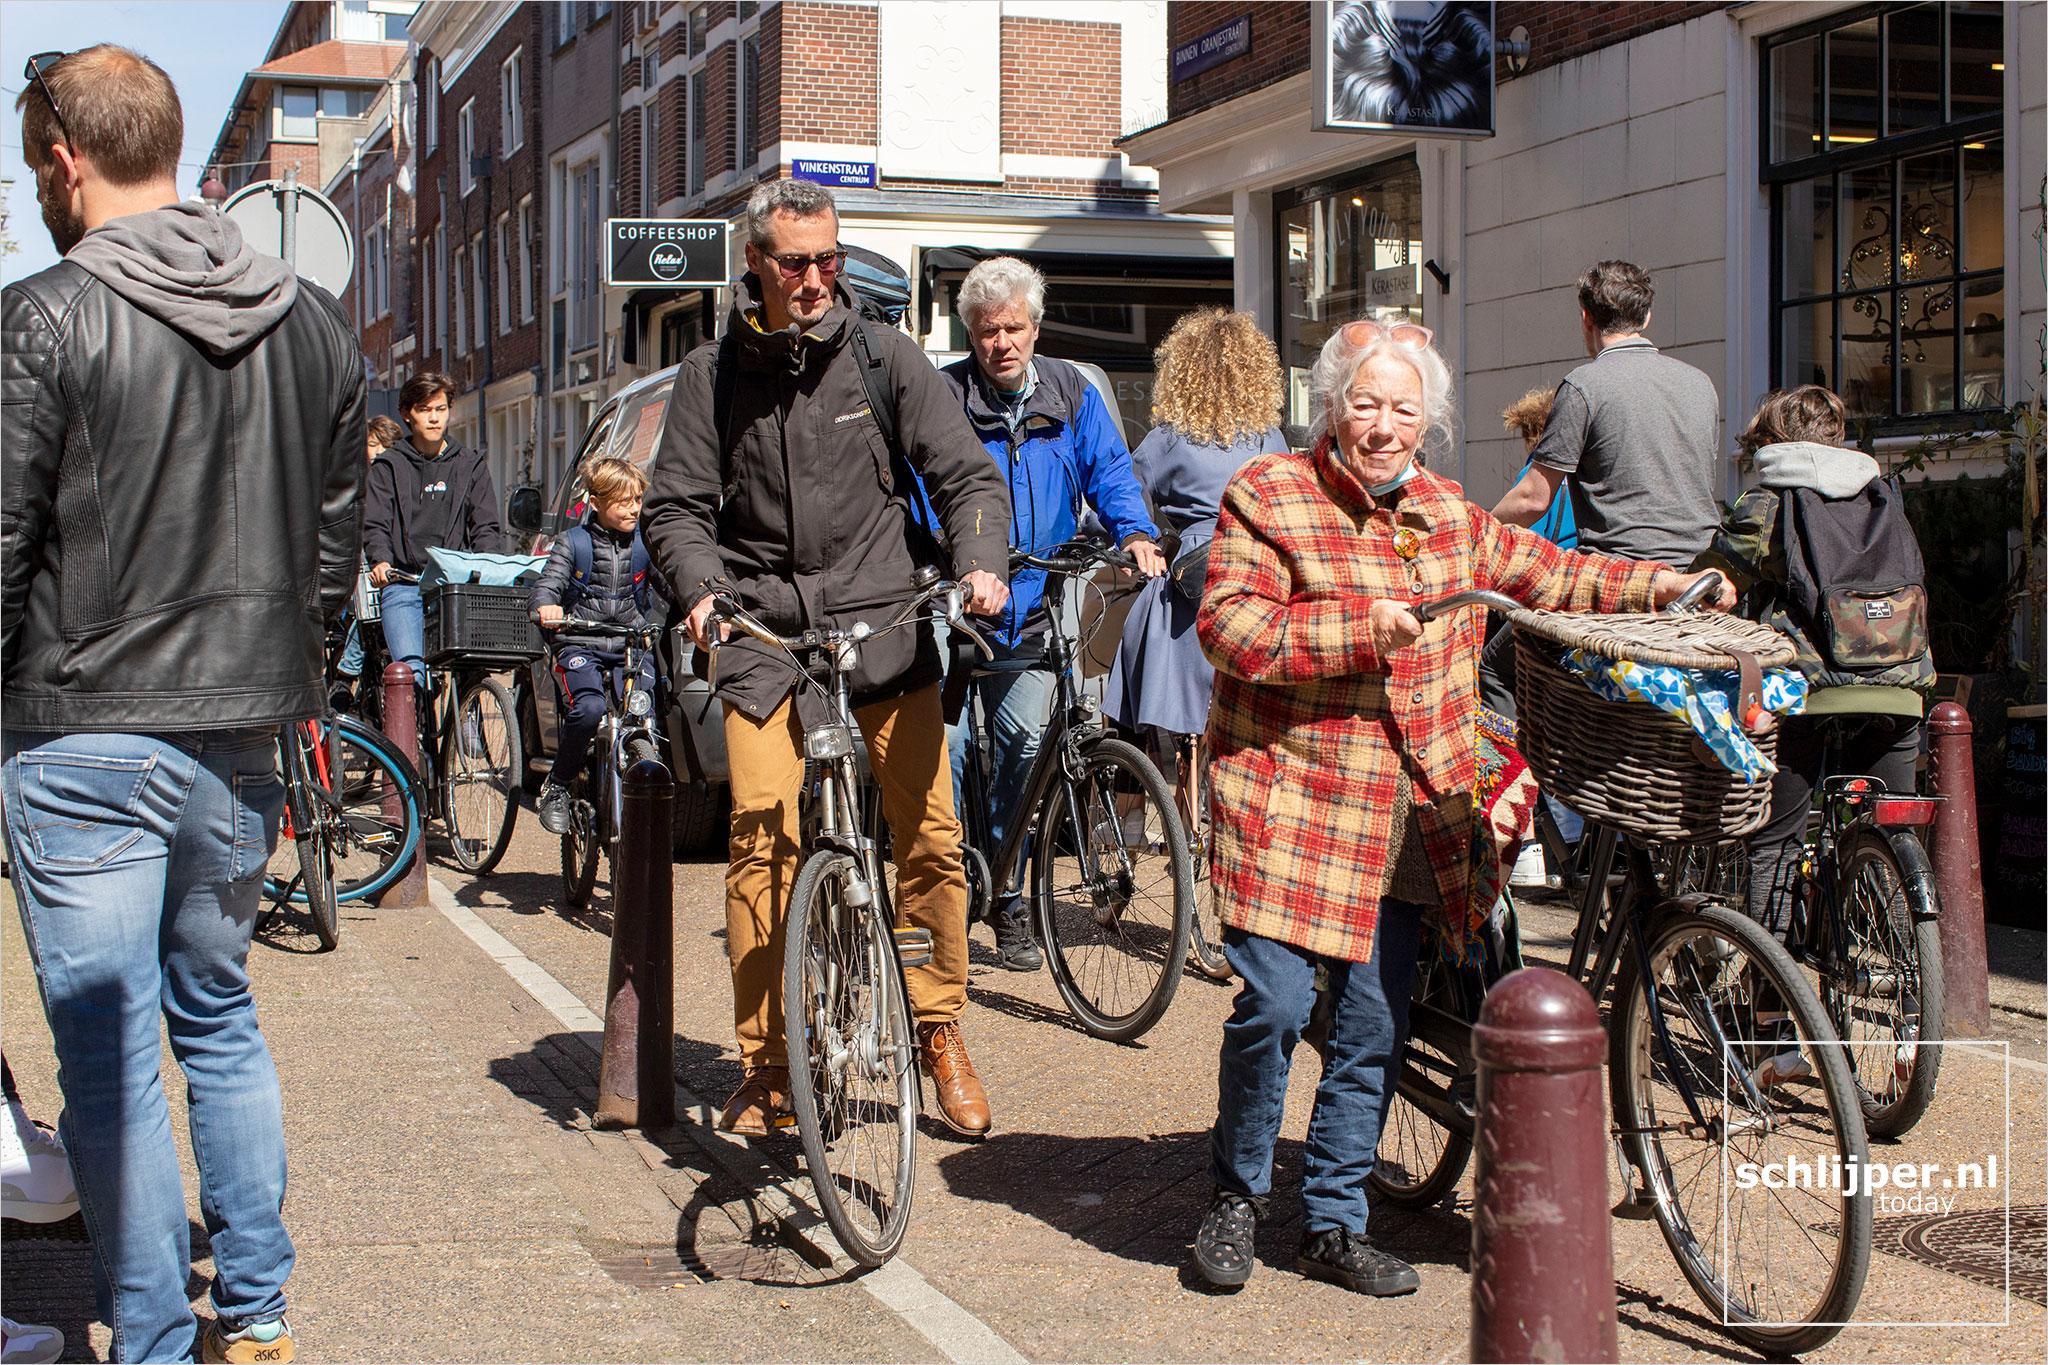 The Netherlands, Amsterdam, 26 april 2021